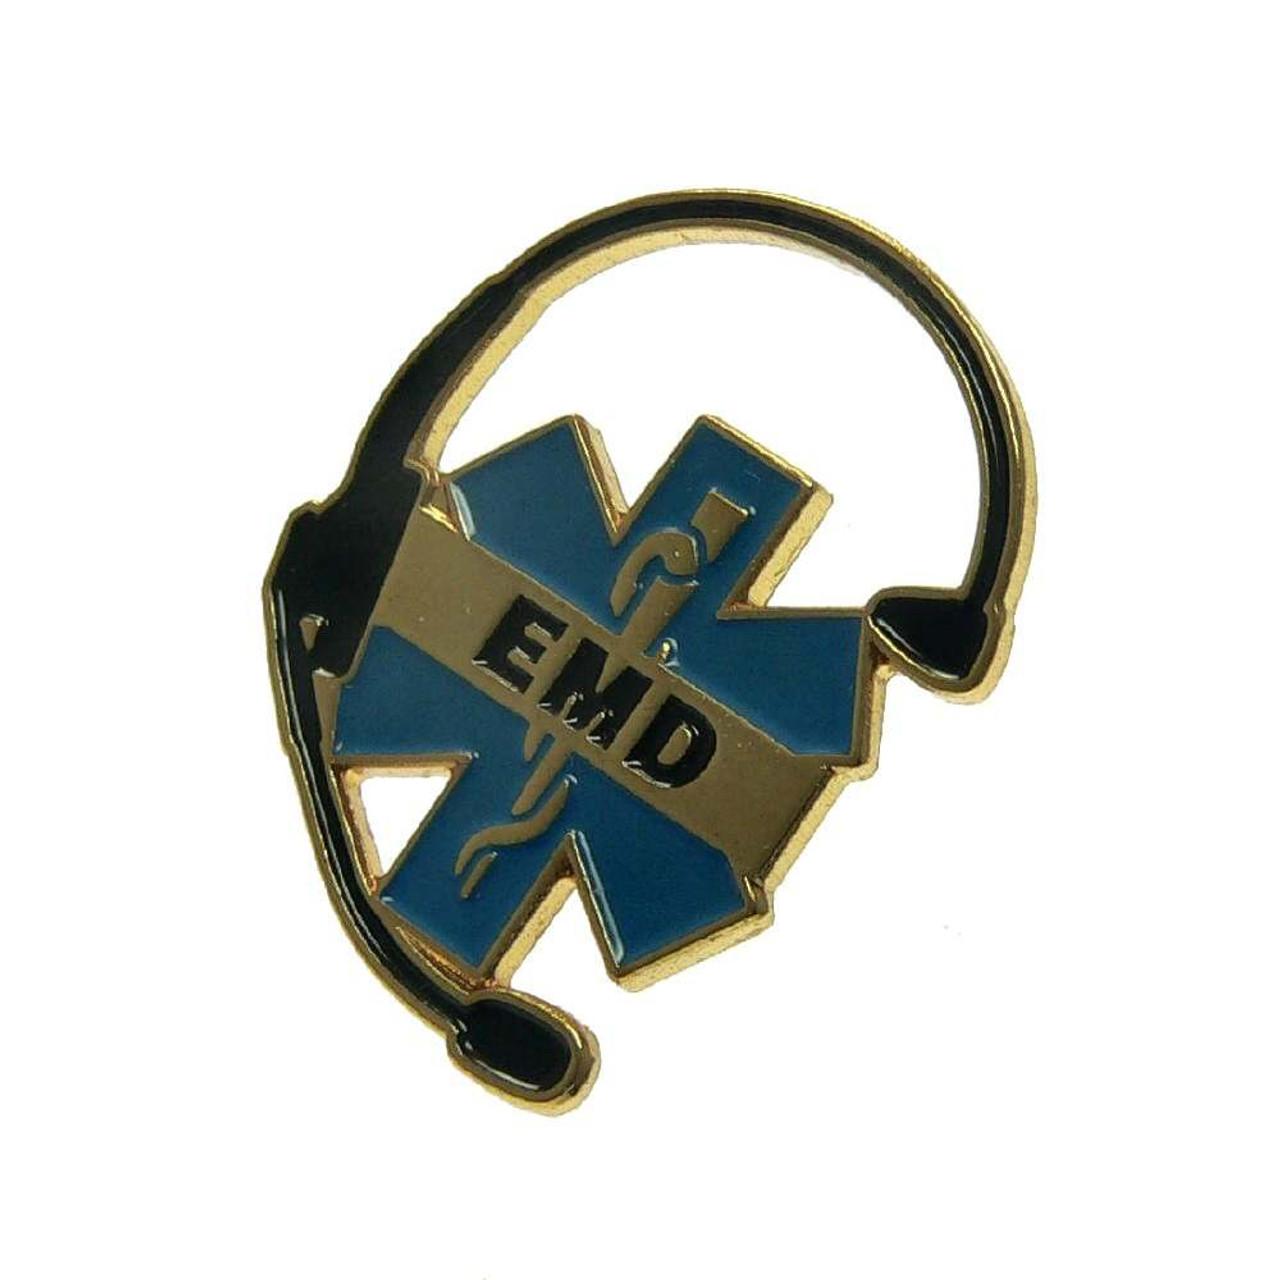 Medical dispatcher emd lapel pin emergency medical dispatcher emd lapel pin 1betcityfo Gallery